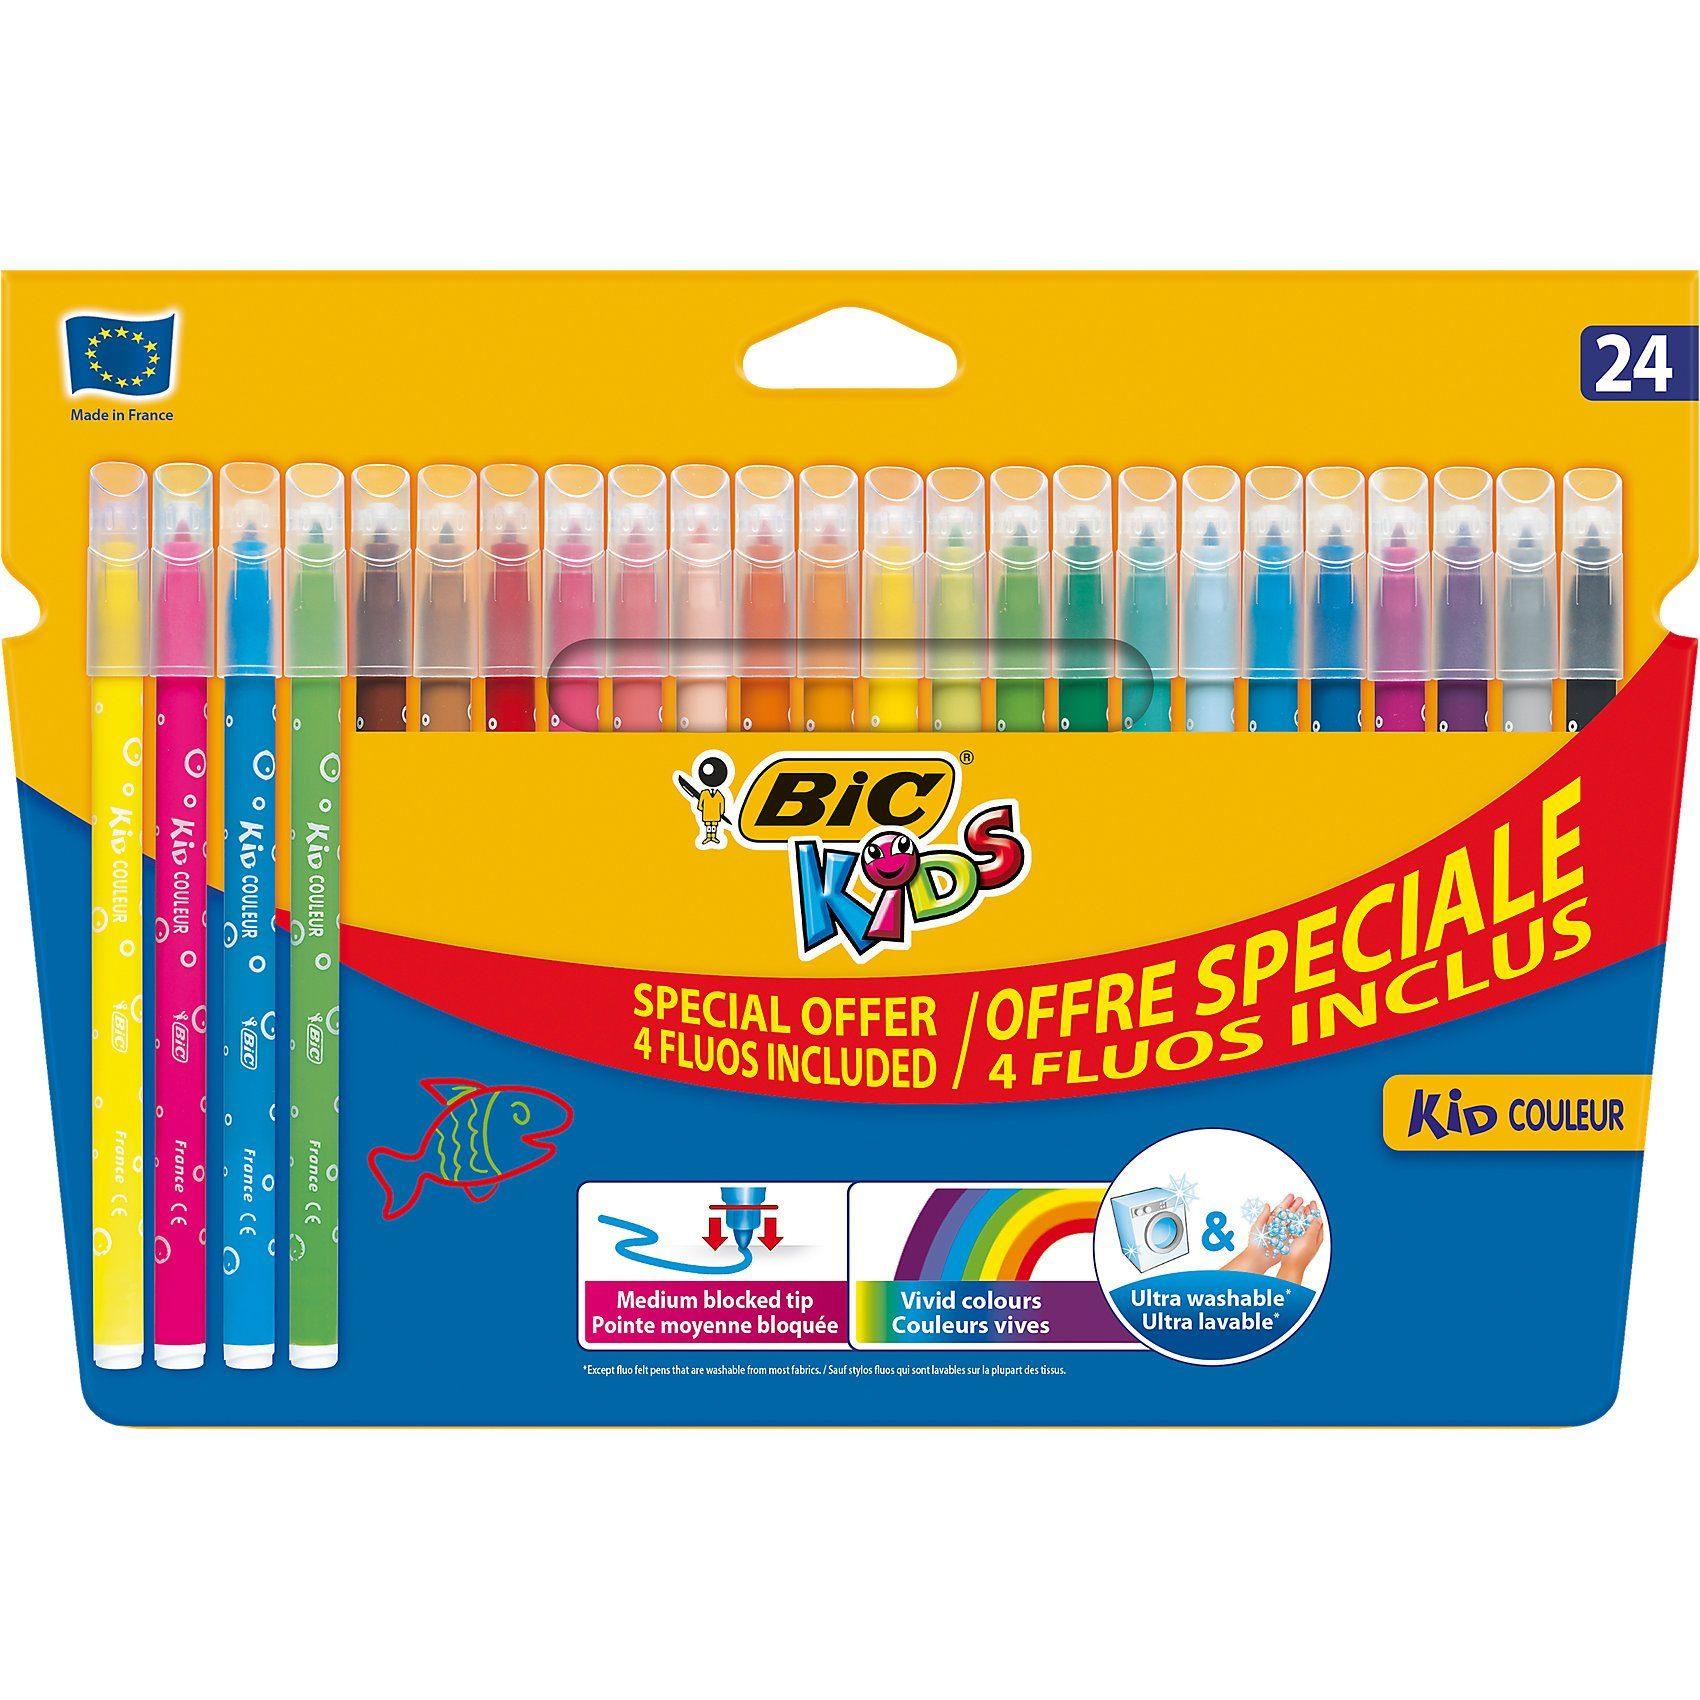 BIC Kids Kid Couleur Filzstifte, 24 Farben